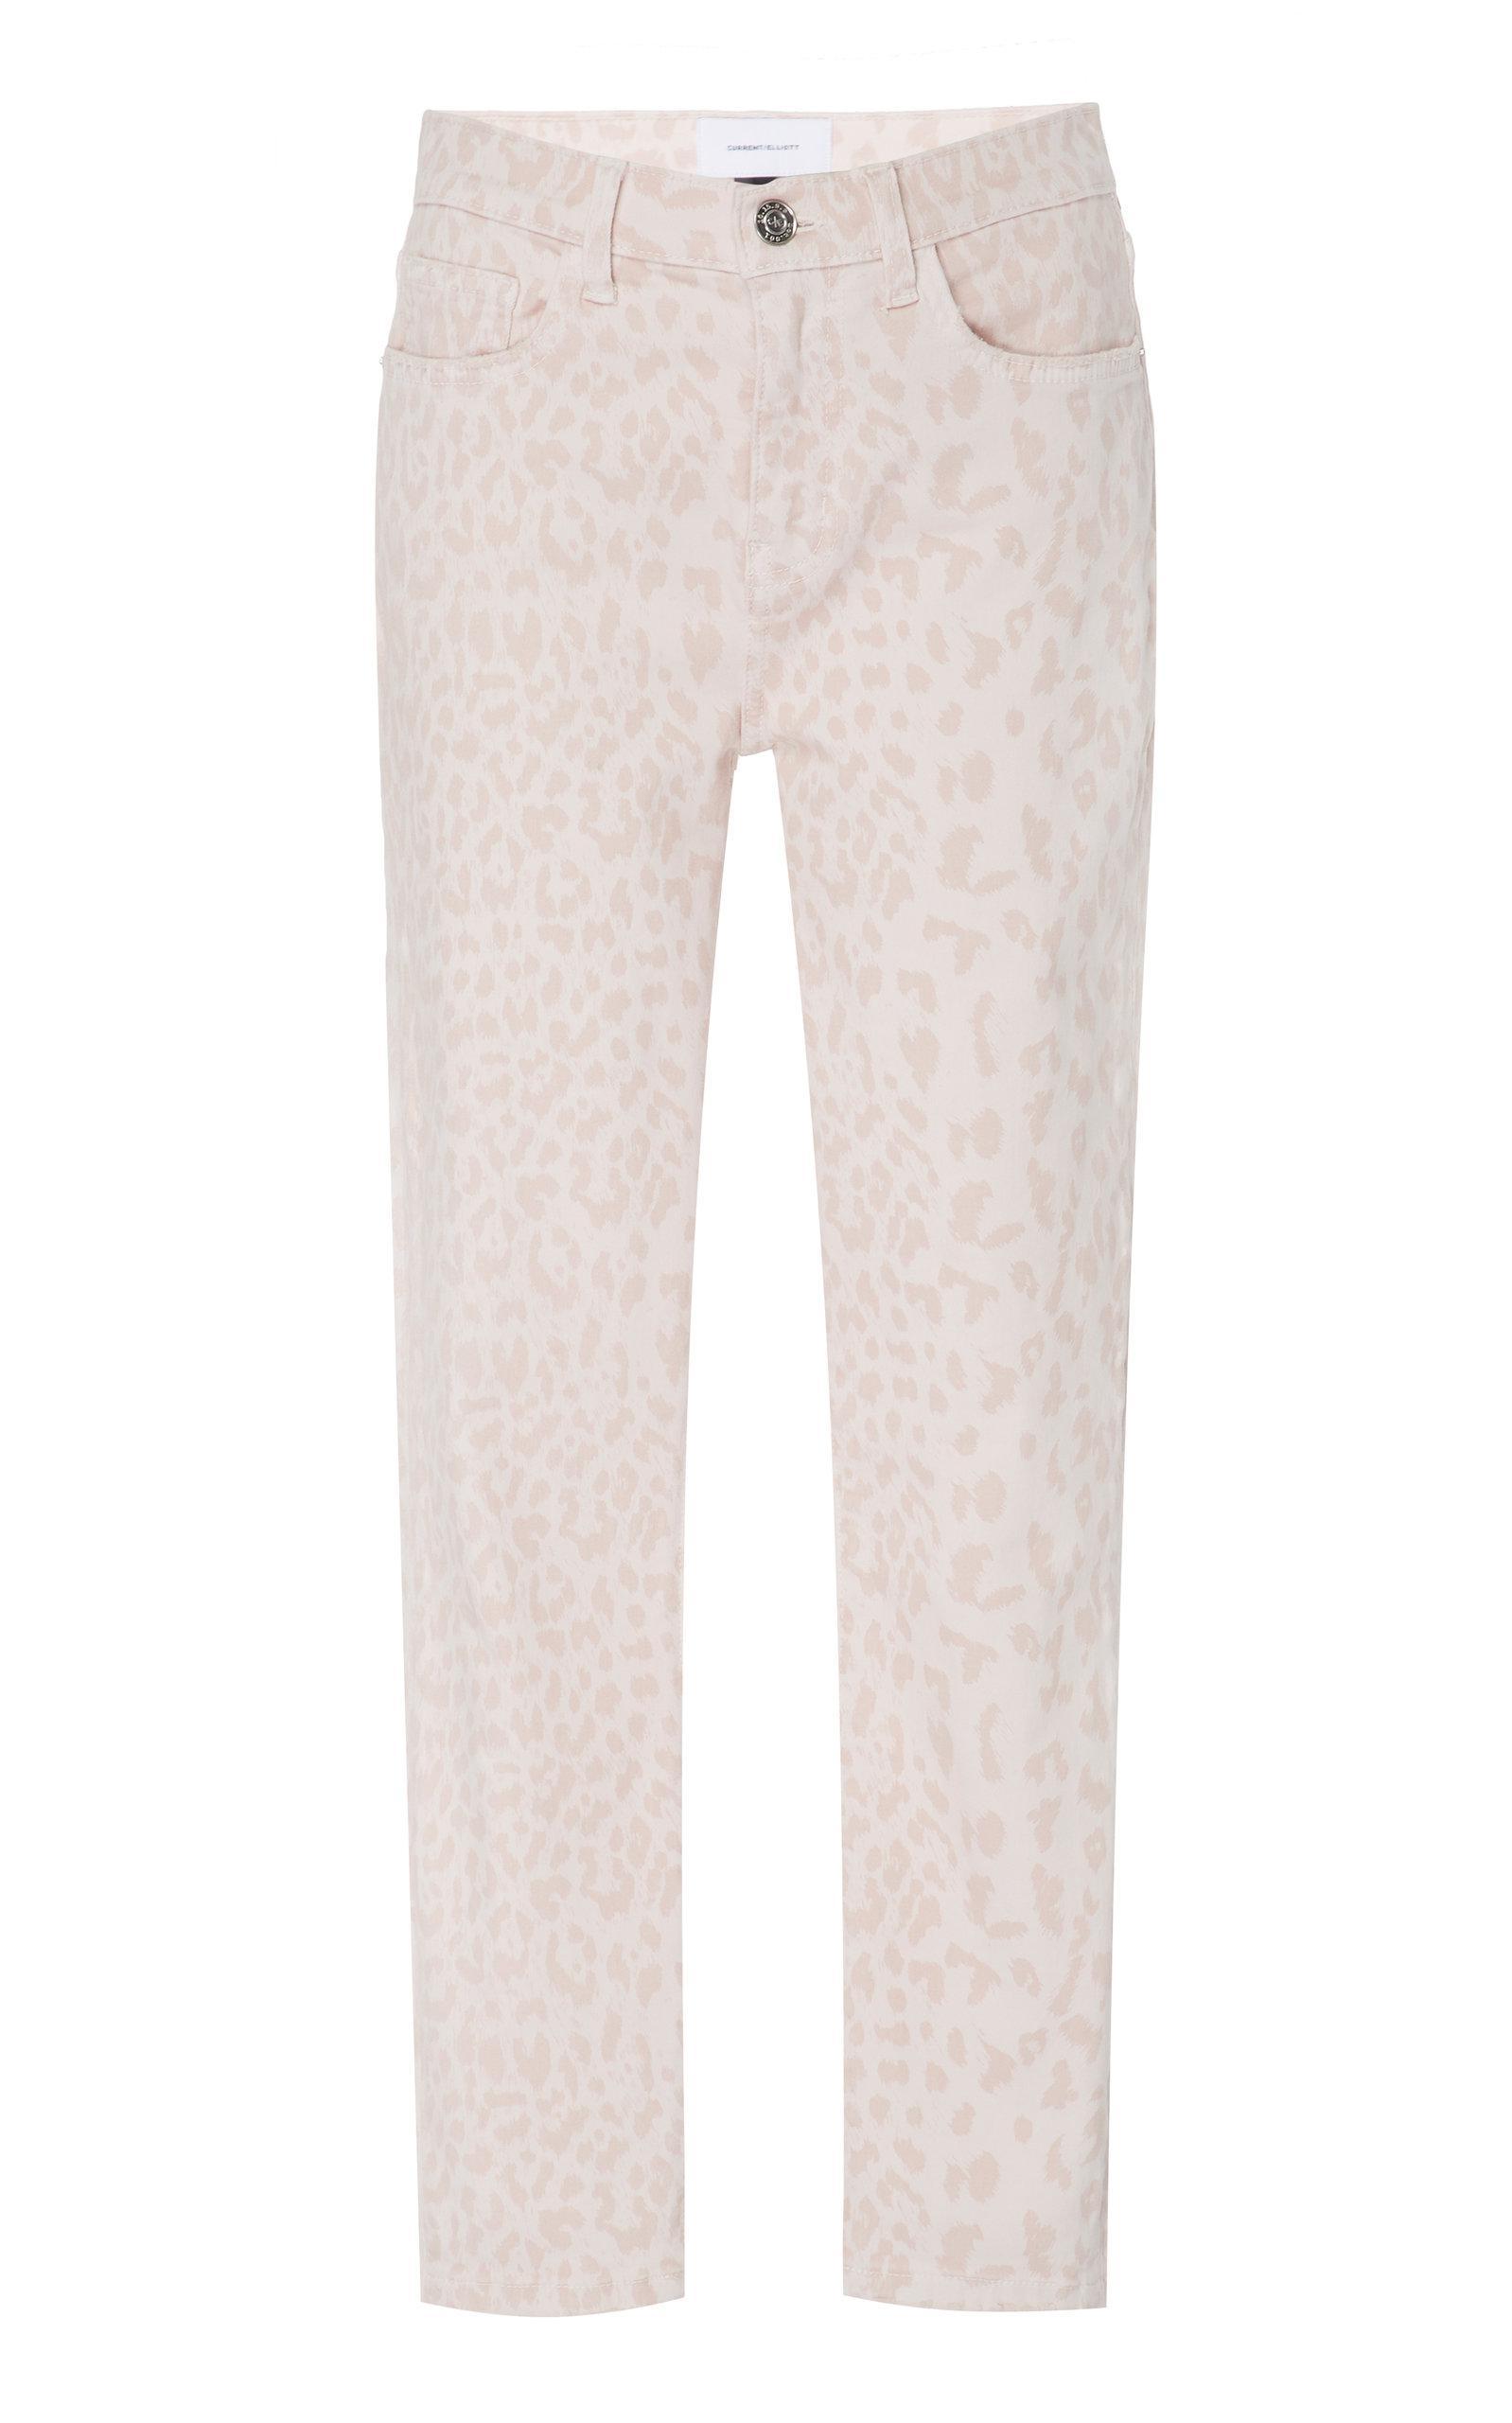 76a922f7b Current/Elliott - Multicolor High Waist Stiletto Printed Skinny Jeans -  Lyst. View fullscreen